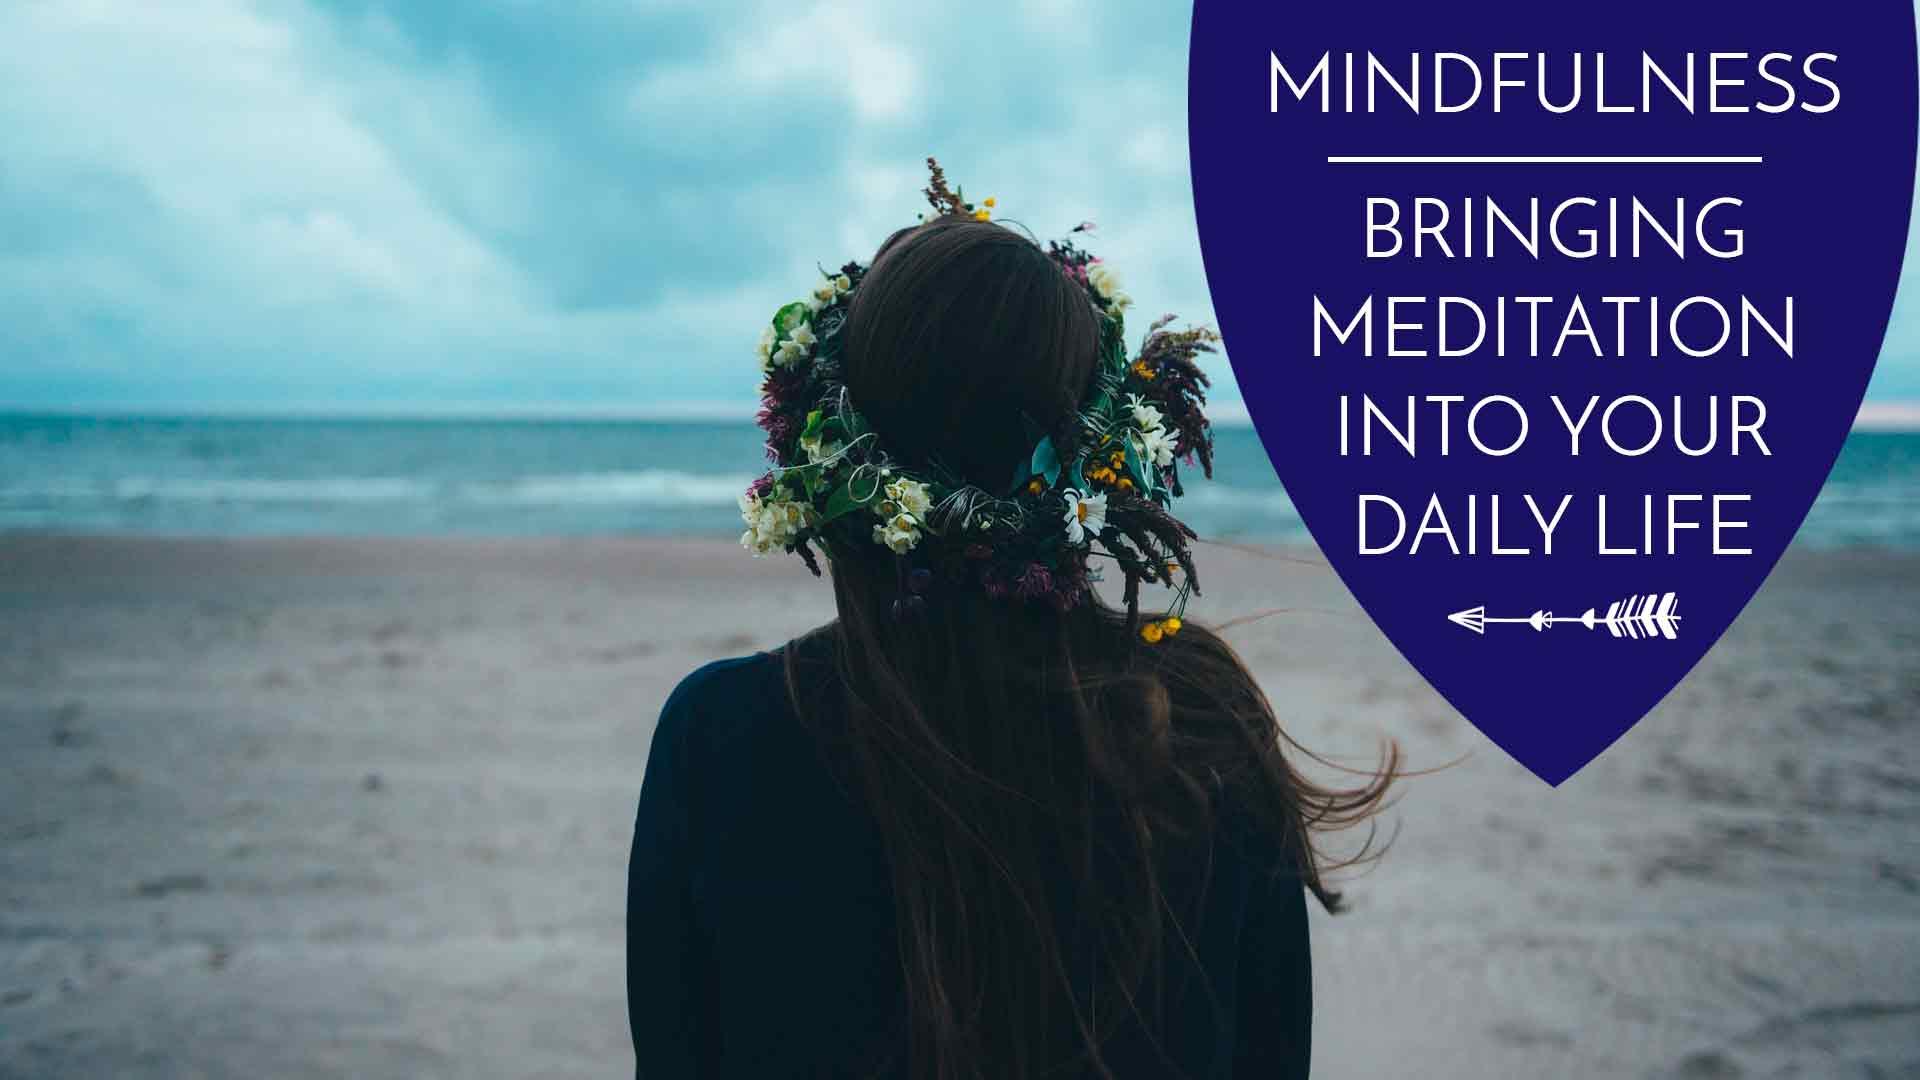 Mindfulness: Bringing Meditation Into Your Daily Life. - The Awakened State.